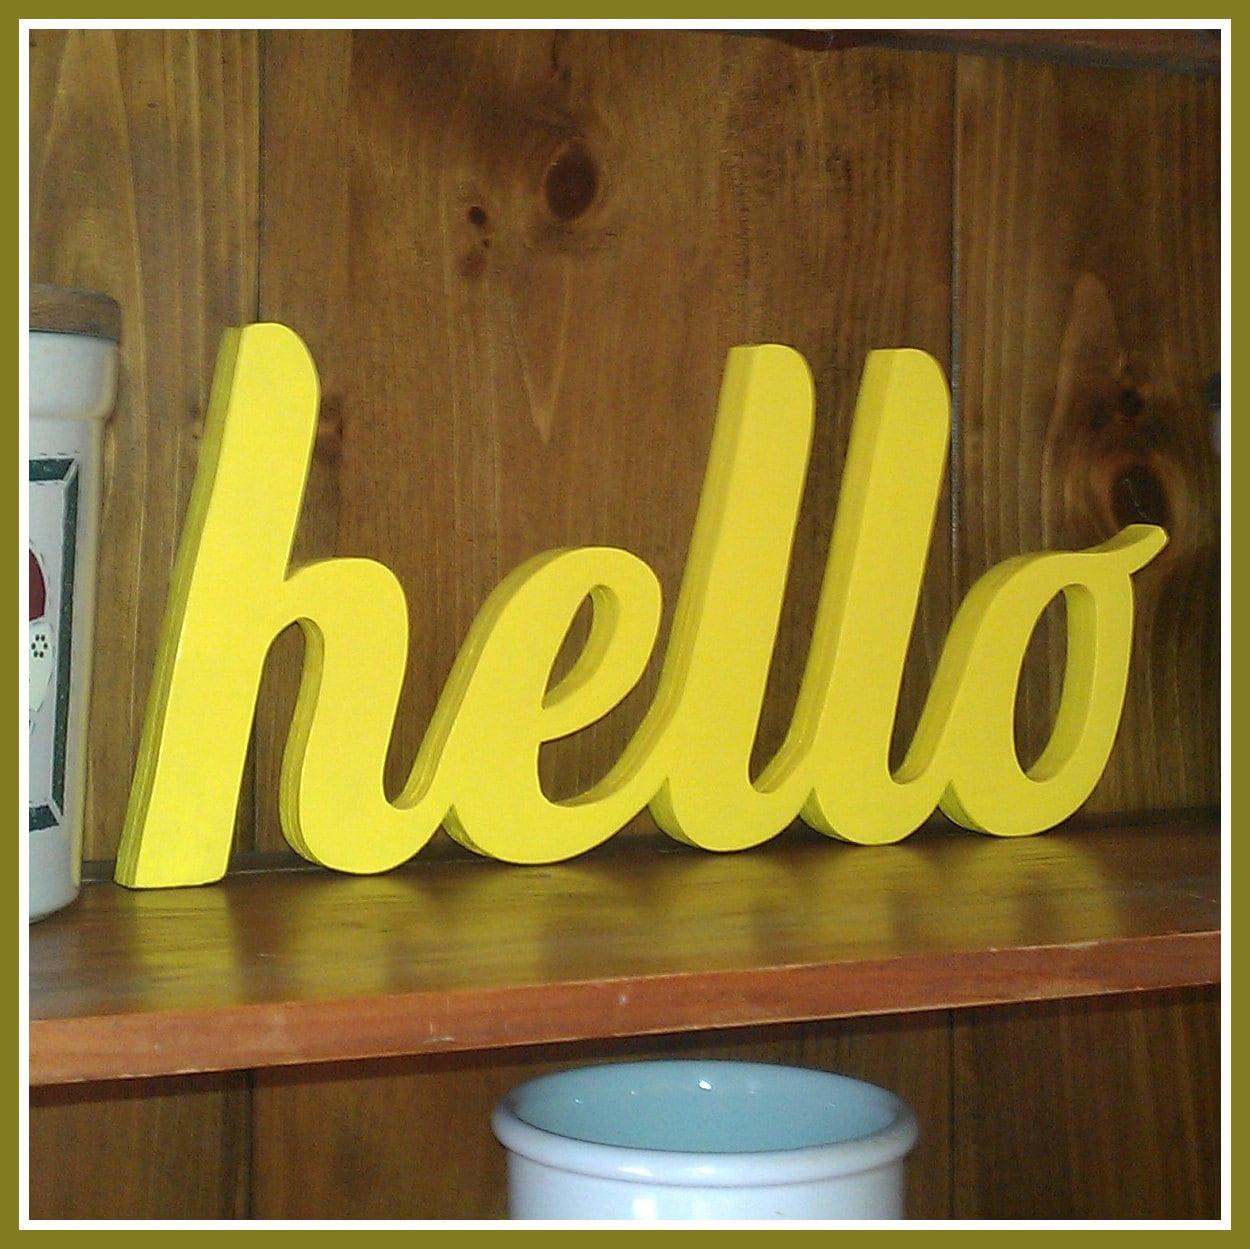 HELLO Wooden Hello Sign stand-alone decoration